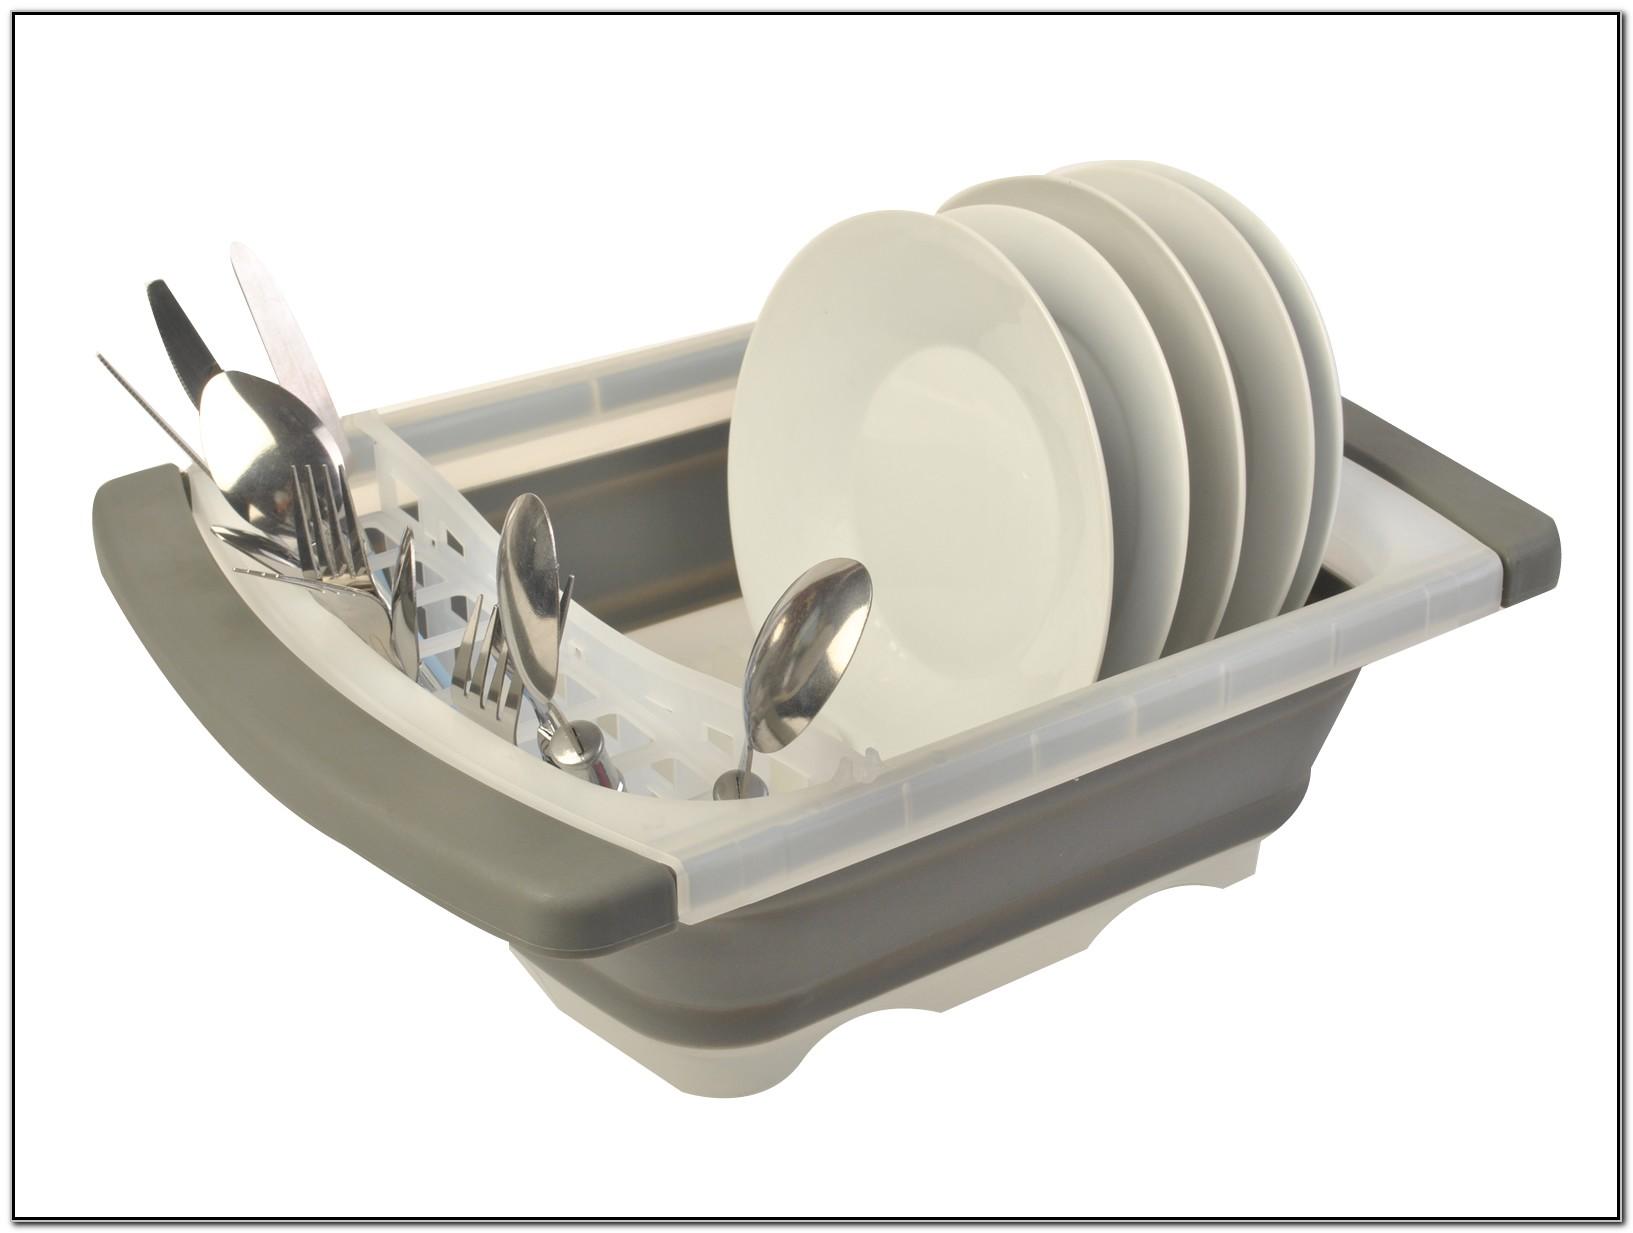 In Sink Dish Drainer Ikea